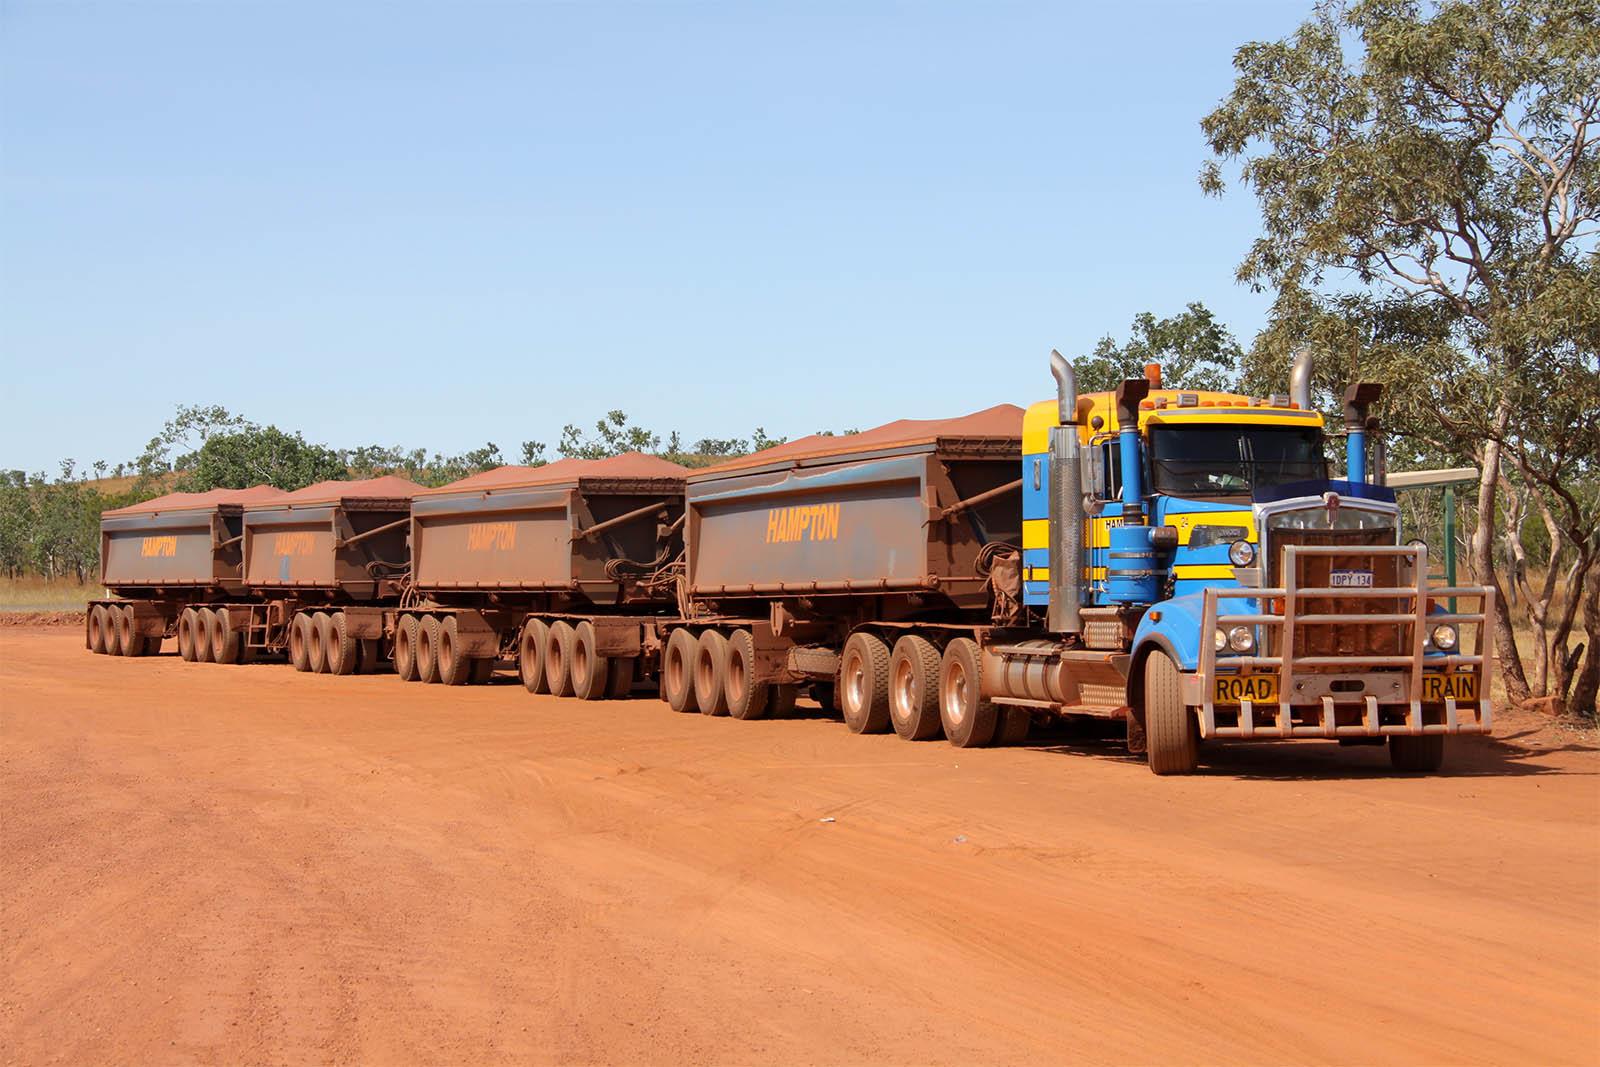 Road Train In Australia Wallpaper And Hintergrund